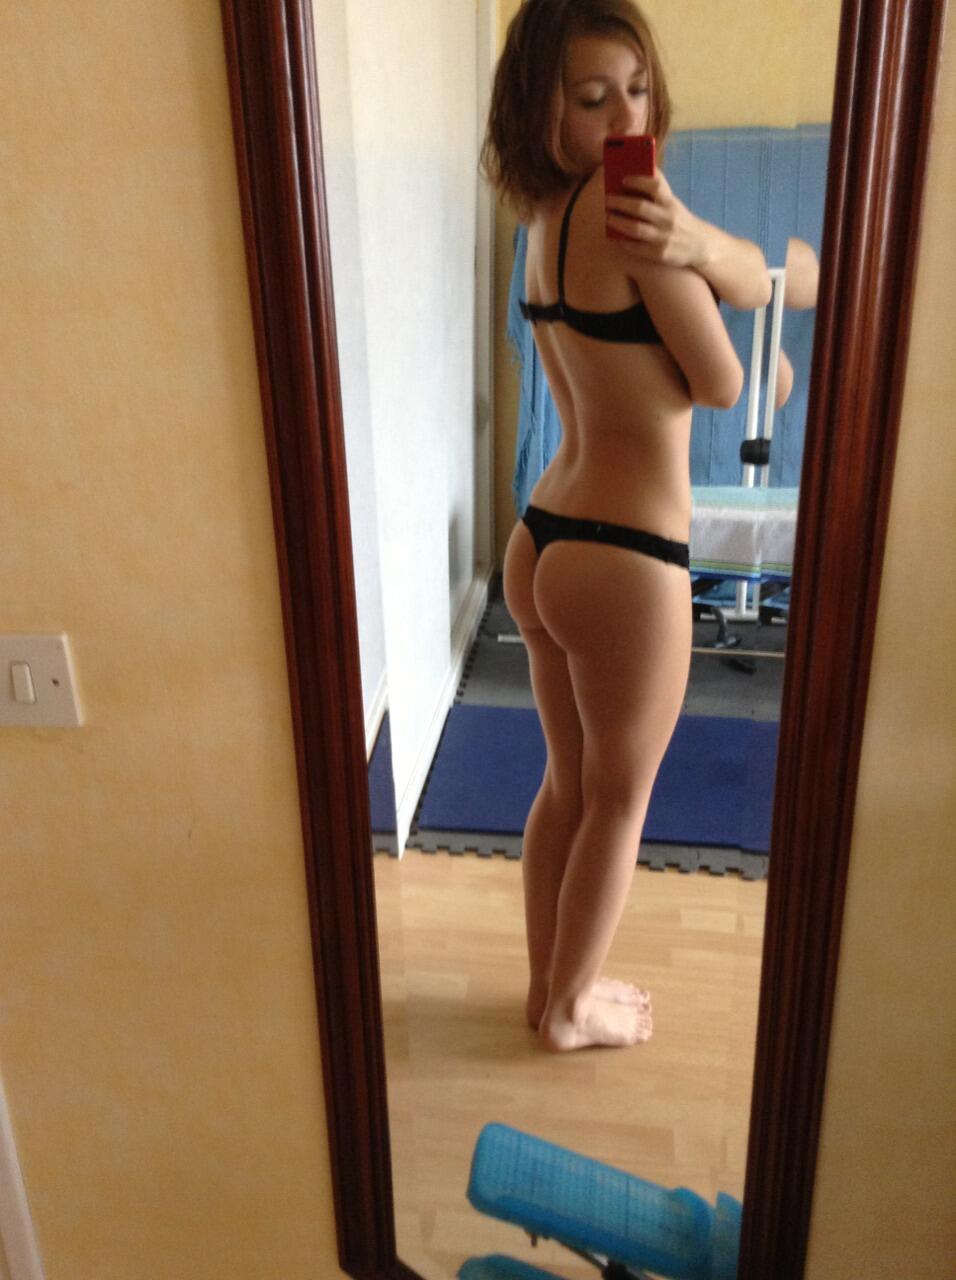 Teenage webcam sex add snapchat teensusan2424 rectum